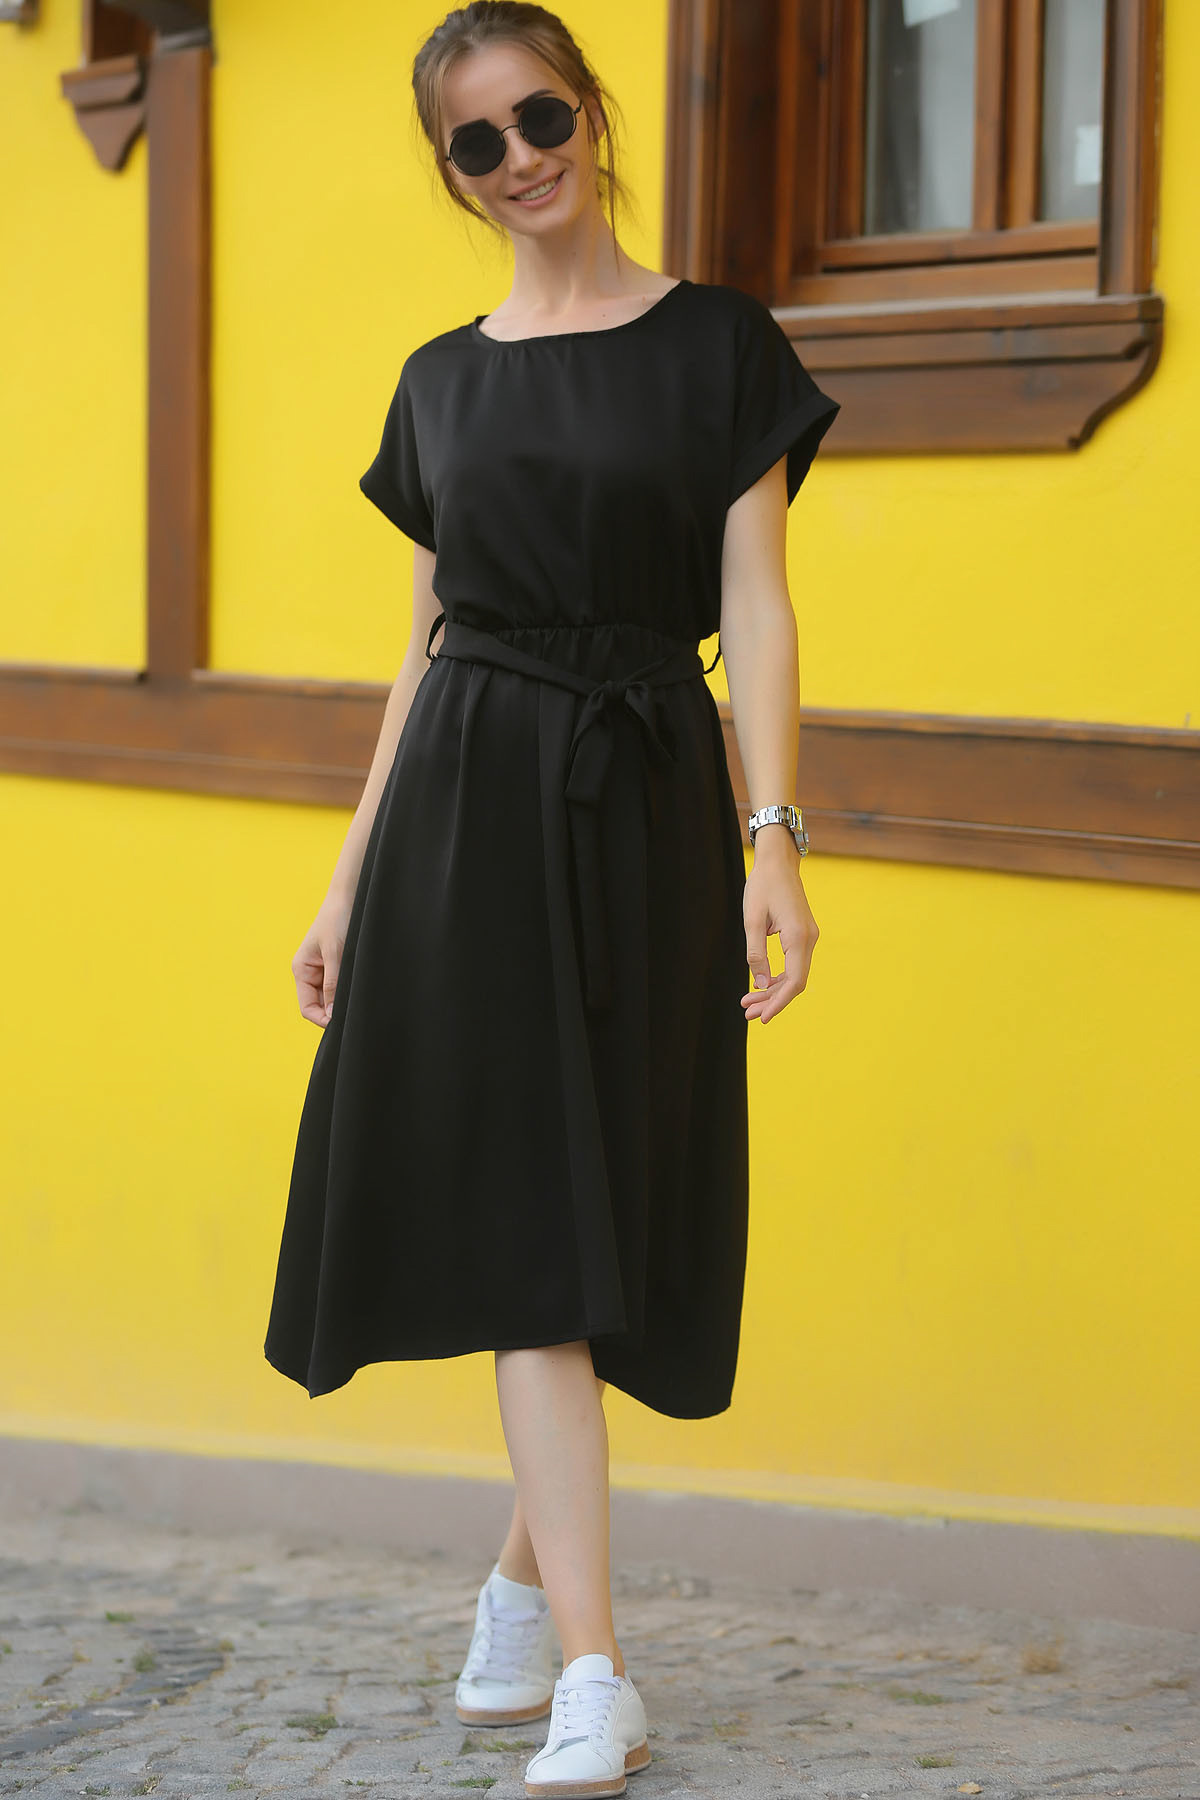 armonika Kadın Siyah Beli Lastikli Bağlamalı Elbise ARM-18Y001133 2